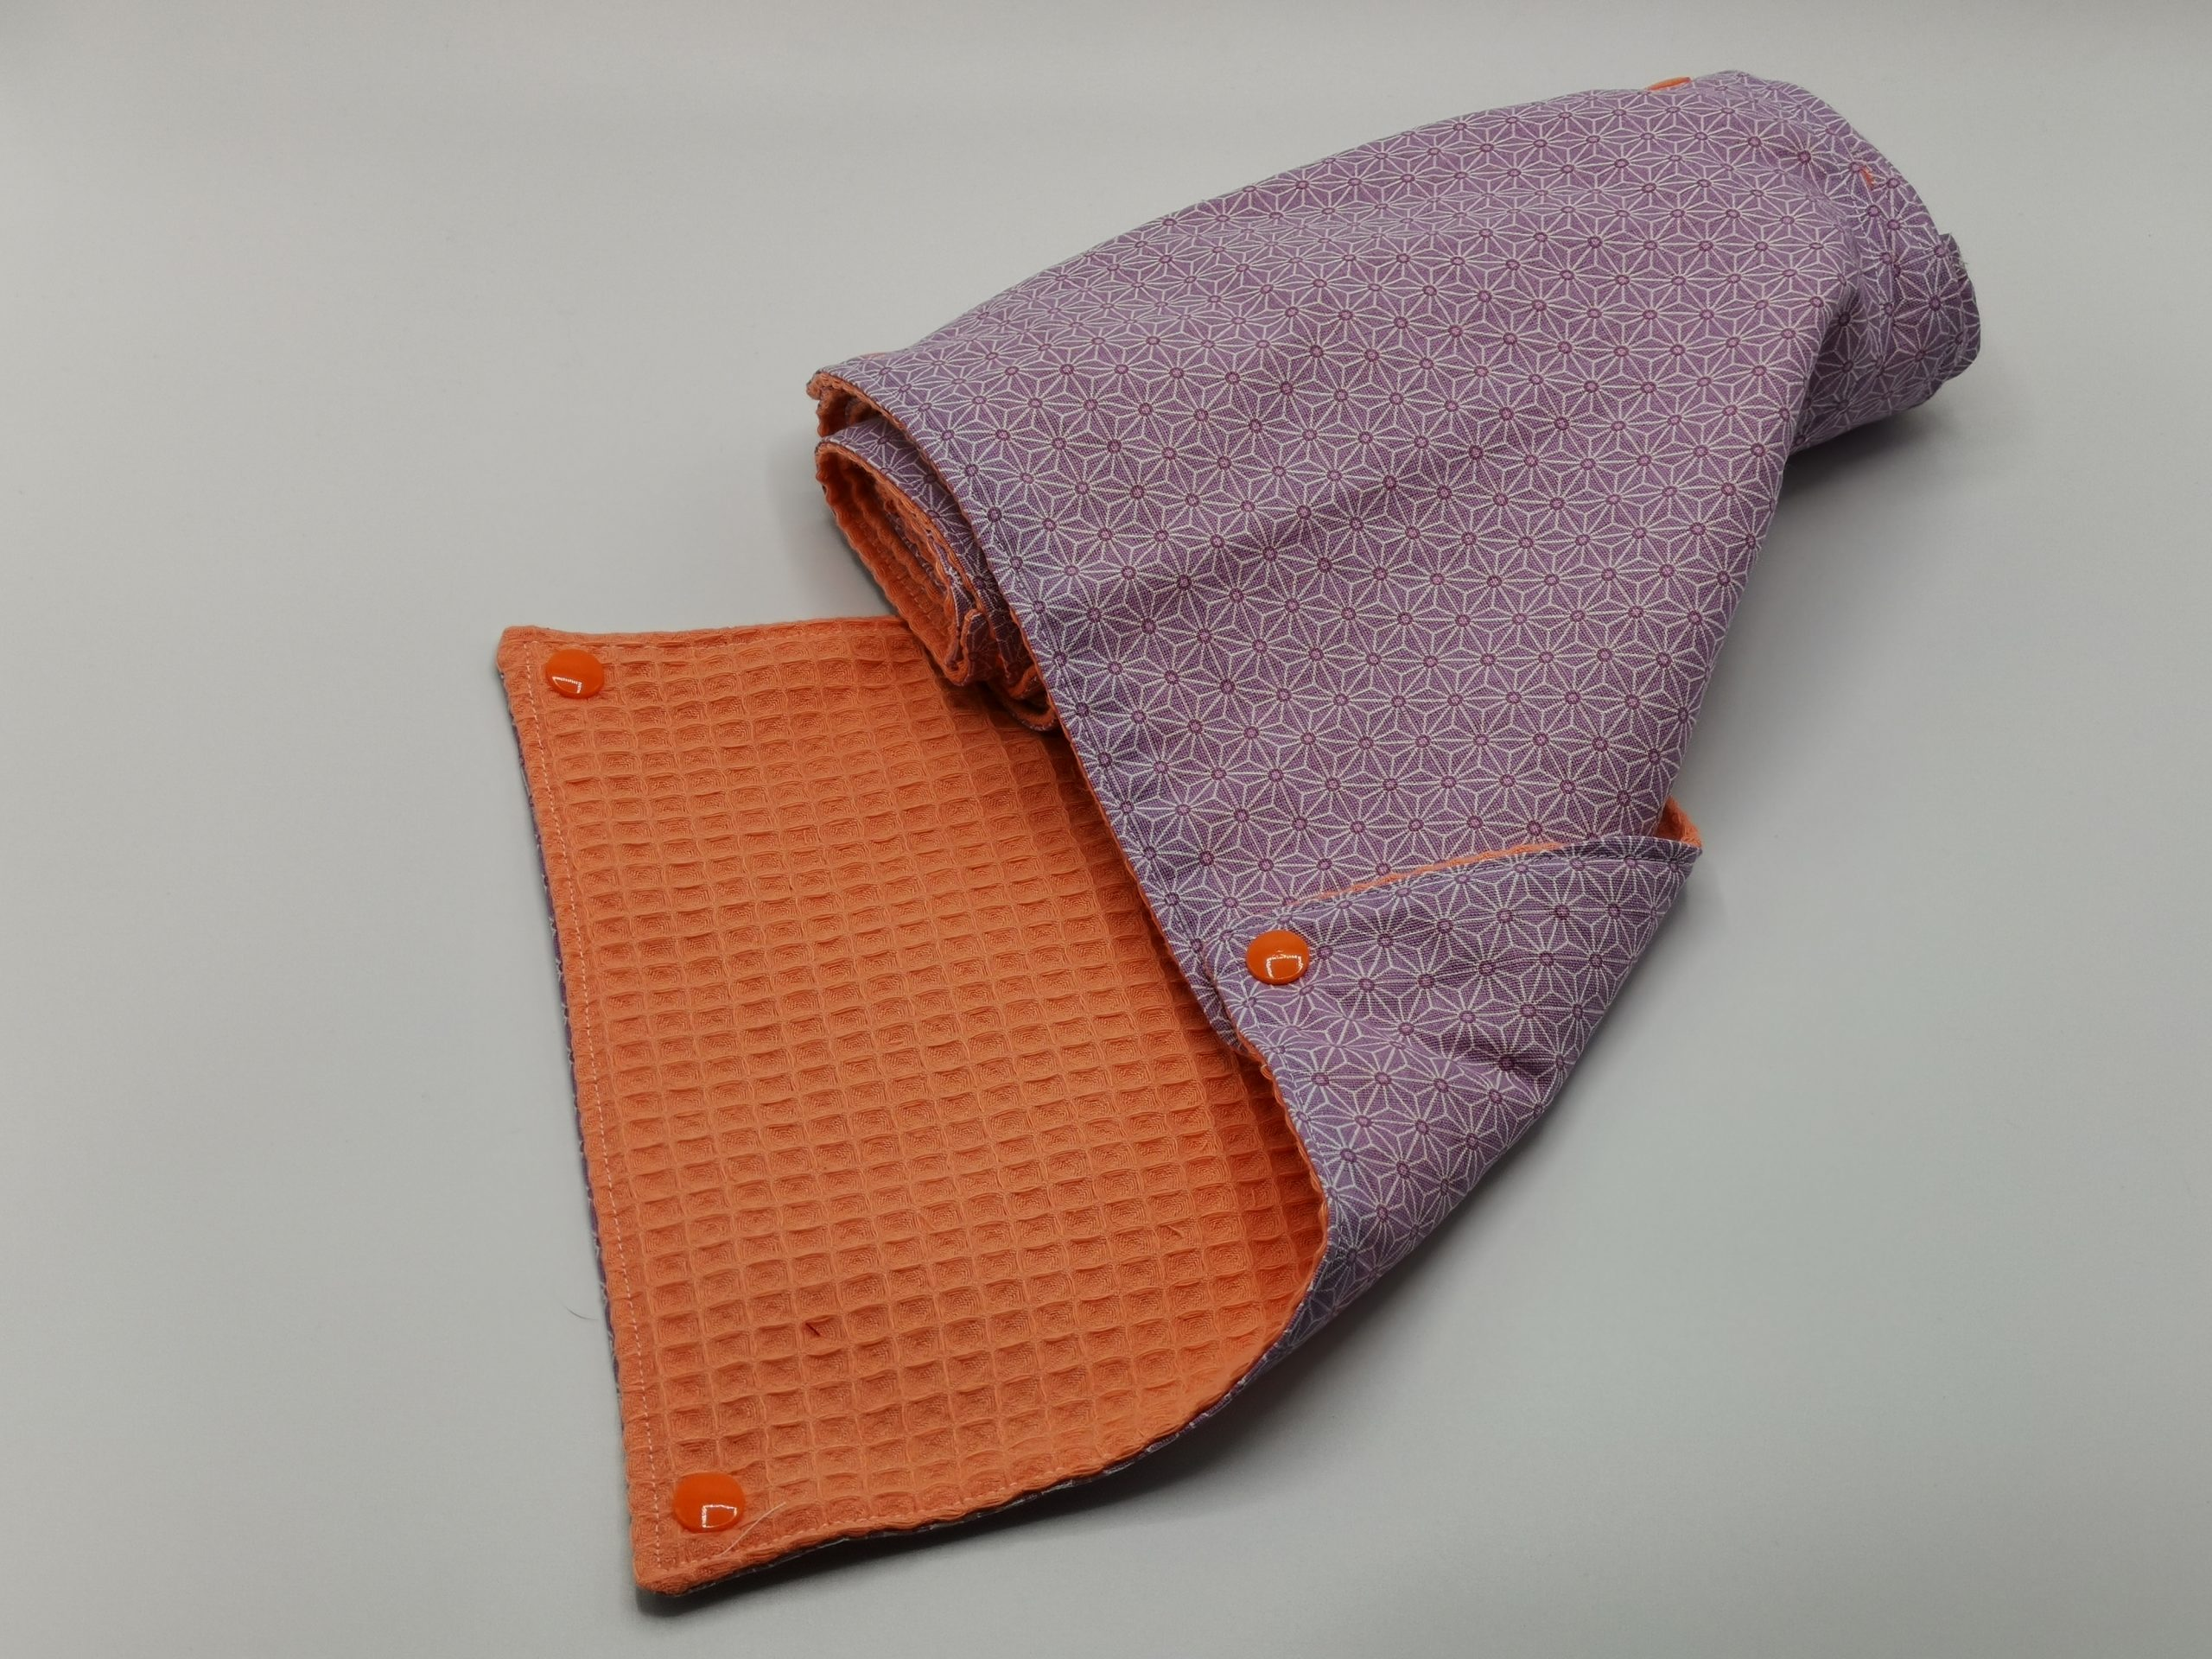 9 feuilles de sopalin artisanal violet orange